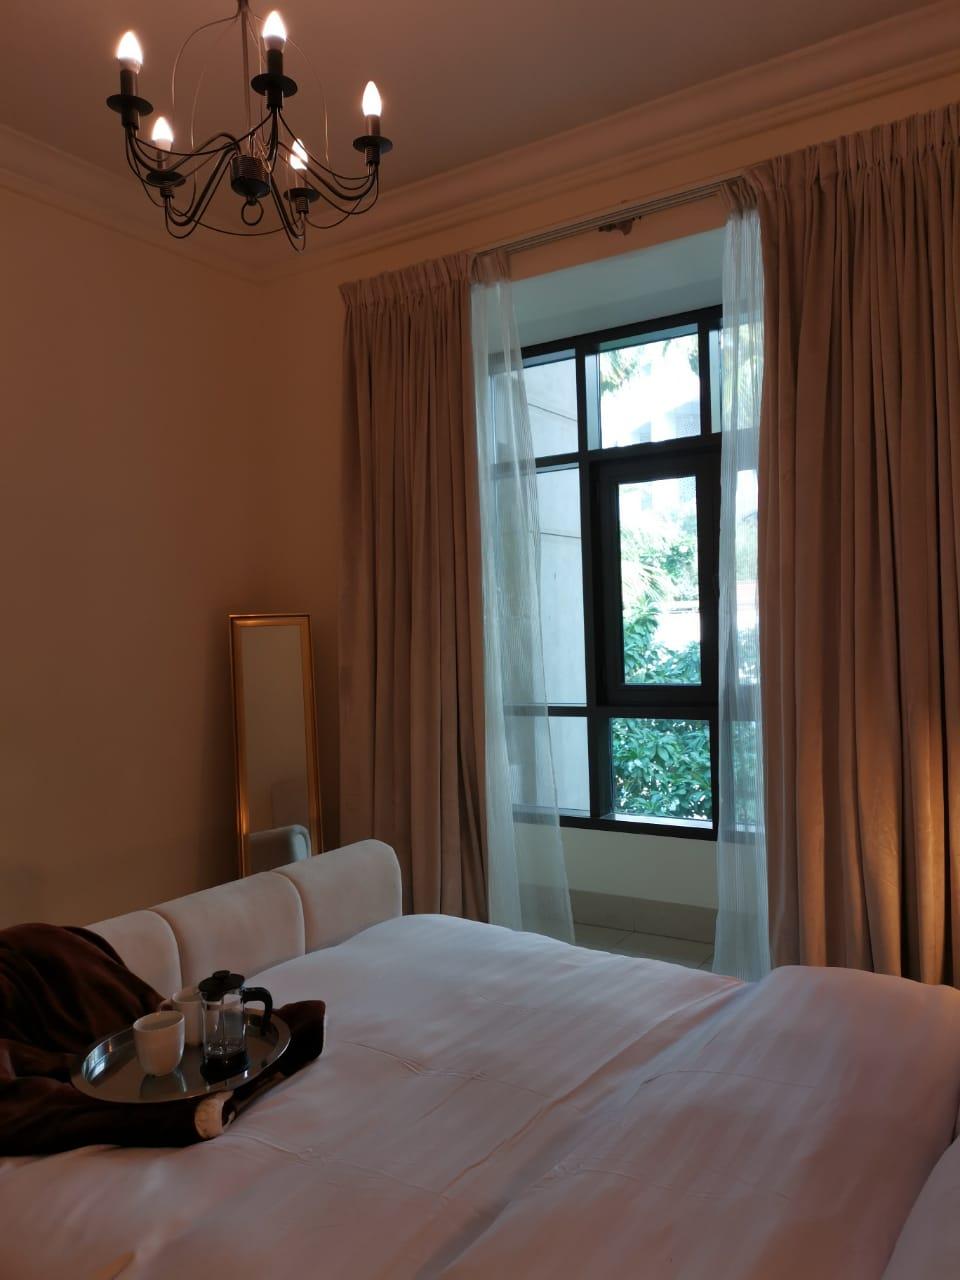 Wonderful stay in the heart of Dubai - SouK Al Bahar photo 27263140